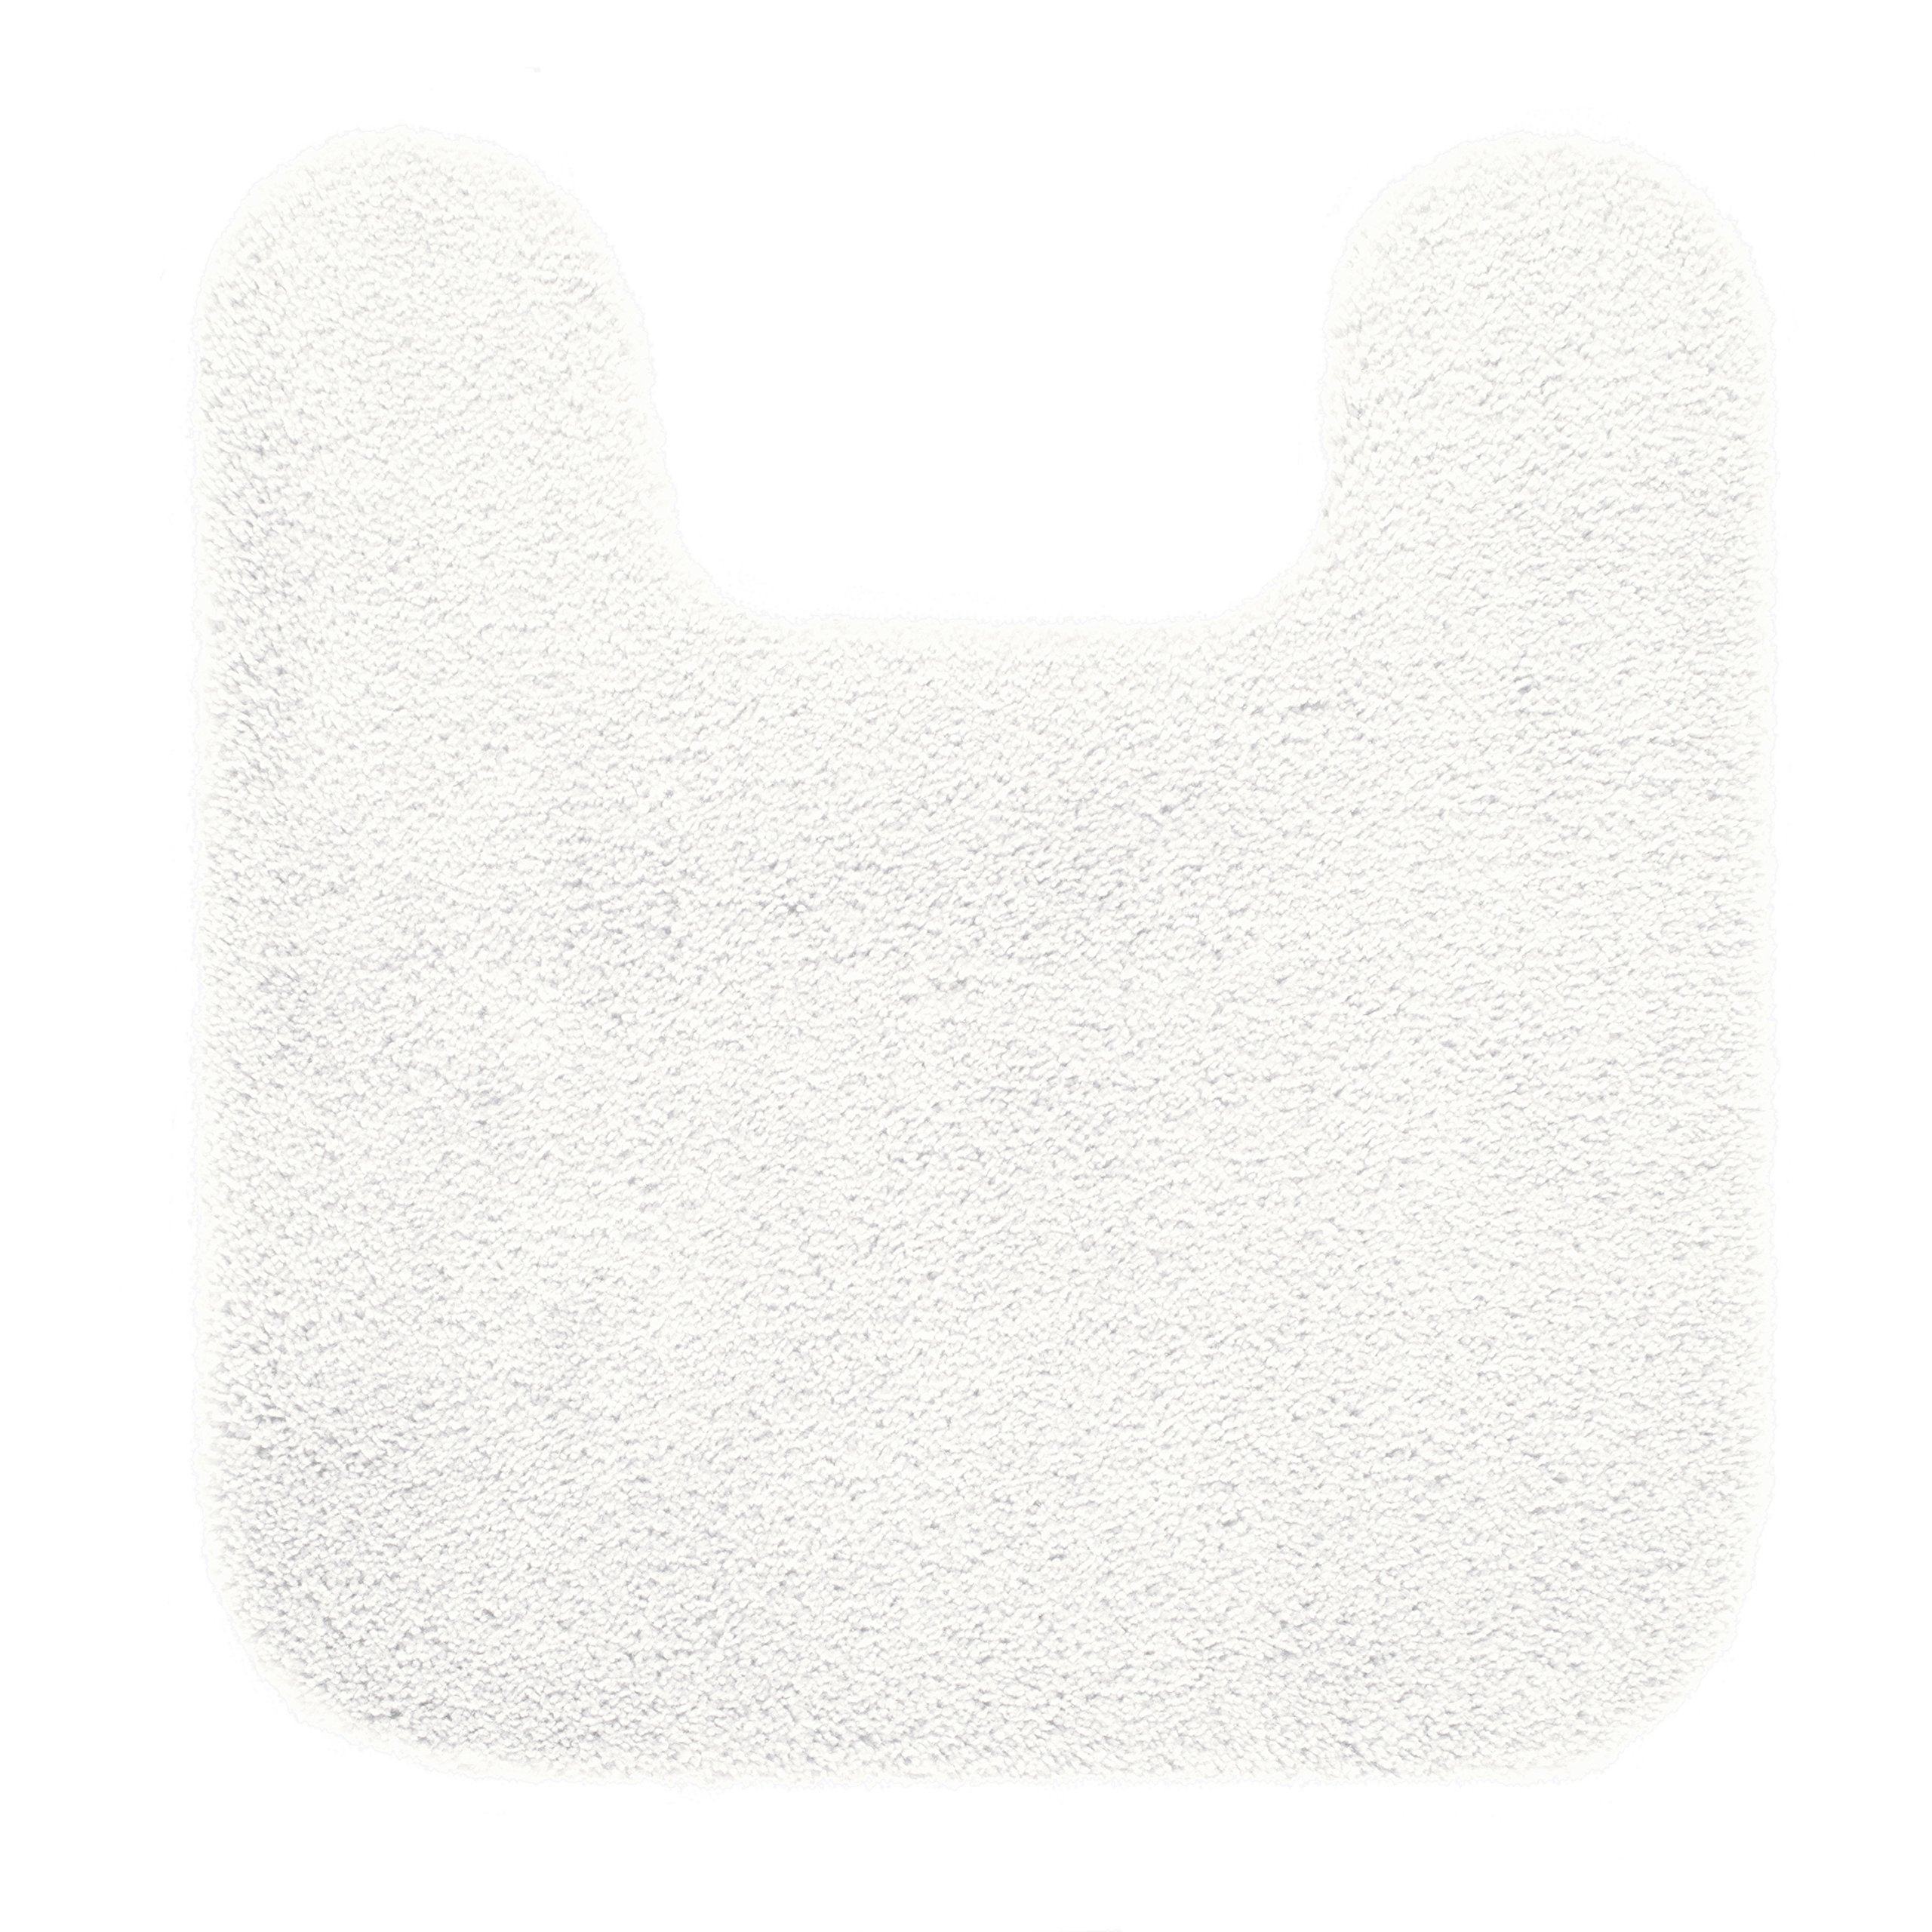 "Maples Rugs Cloud Bath 20"" x 21.5"" Contour Non Slip Toilet Rug [Made in USA] Machine Washable Soft Bath Mat, Arctic White"